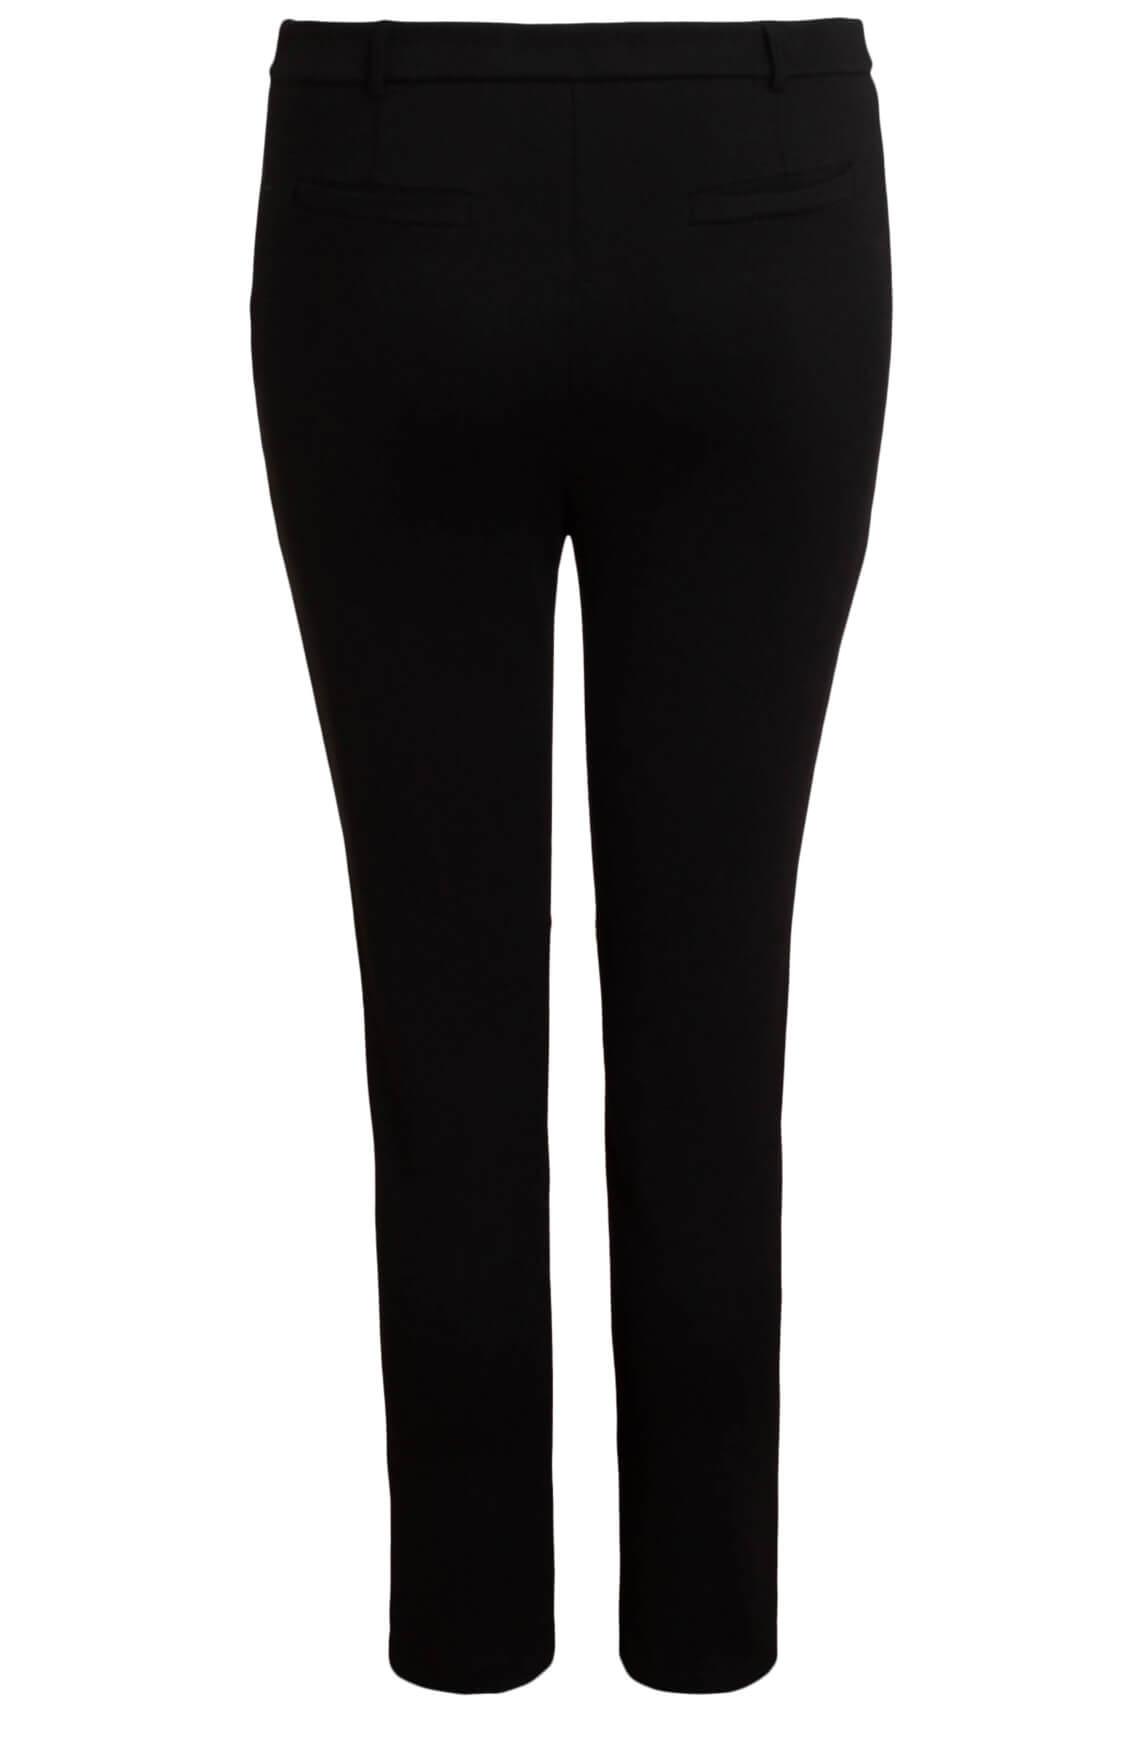 Penn & Ink Dames Jogpantalon met split zwart